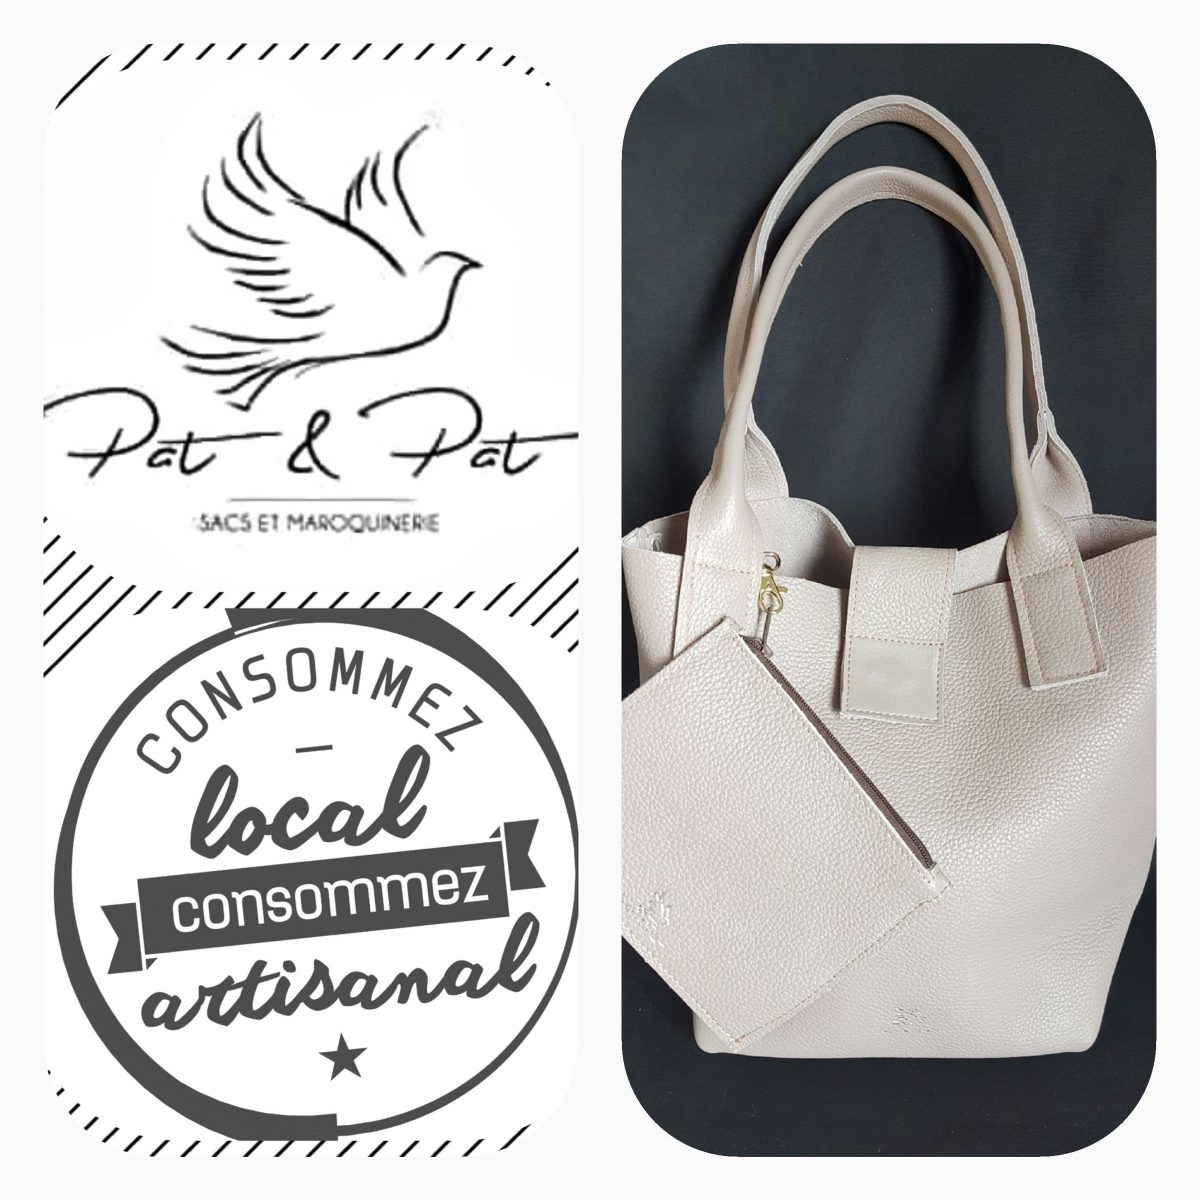 sacs- creations - fait main - made in france - pat &pat